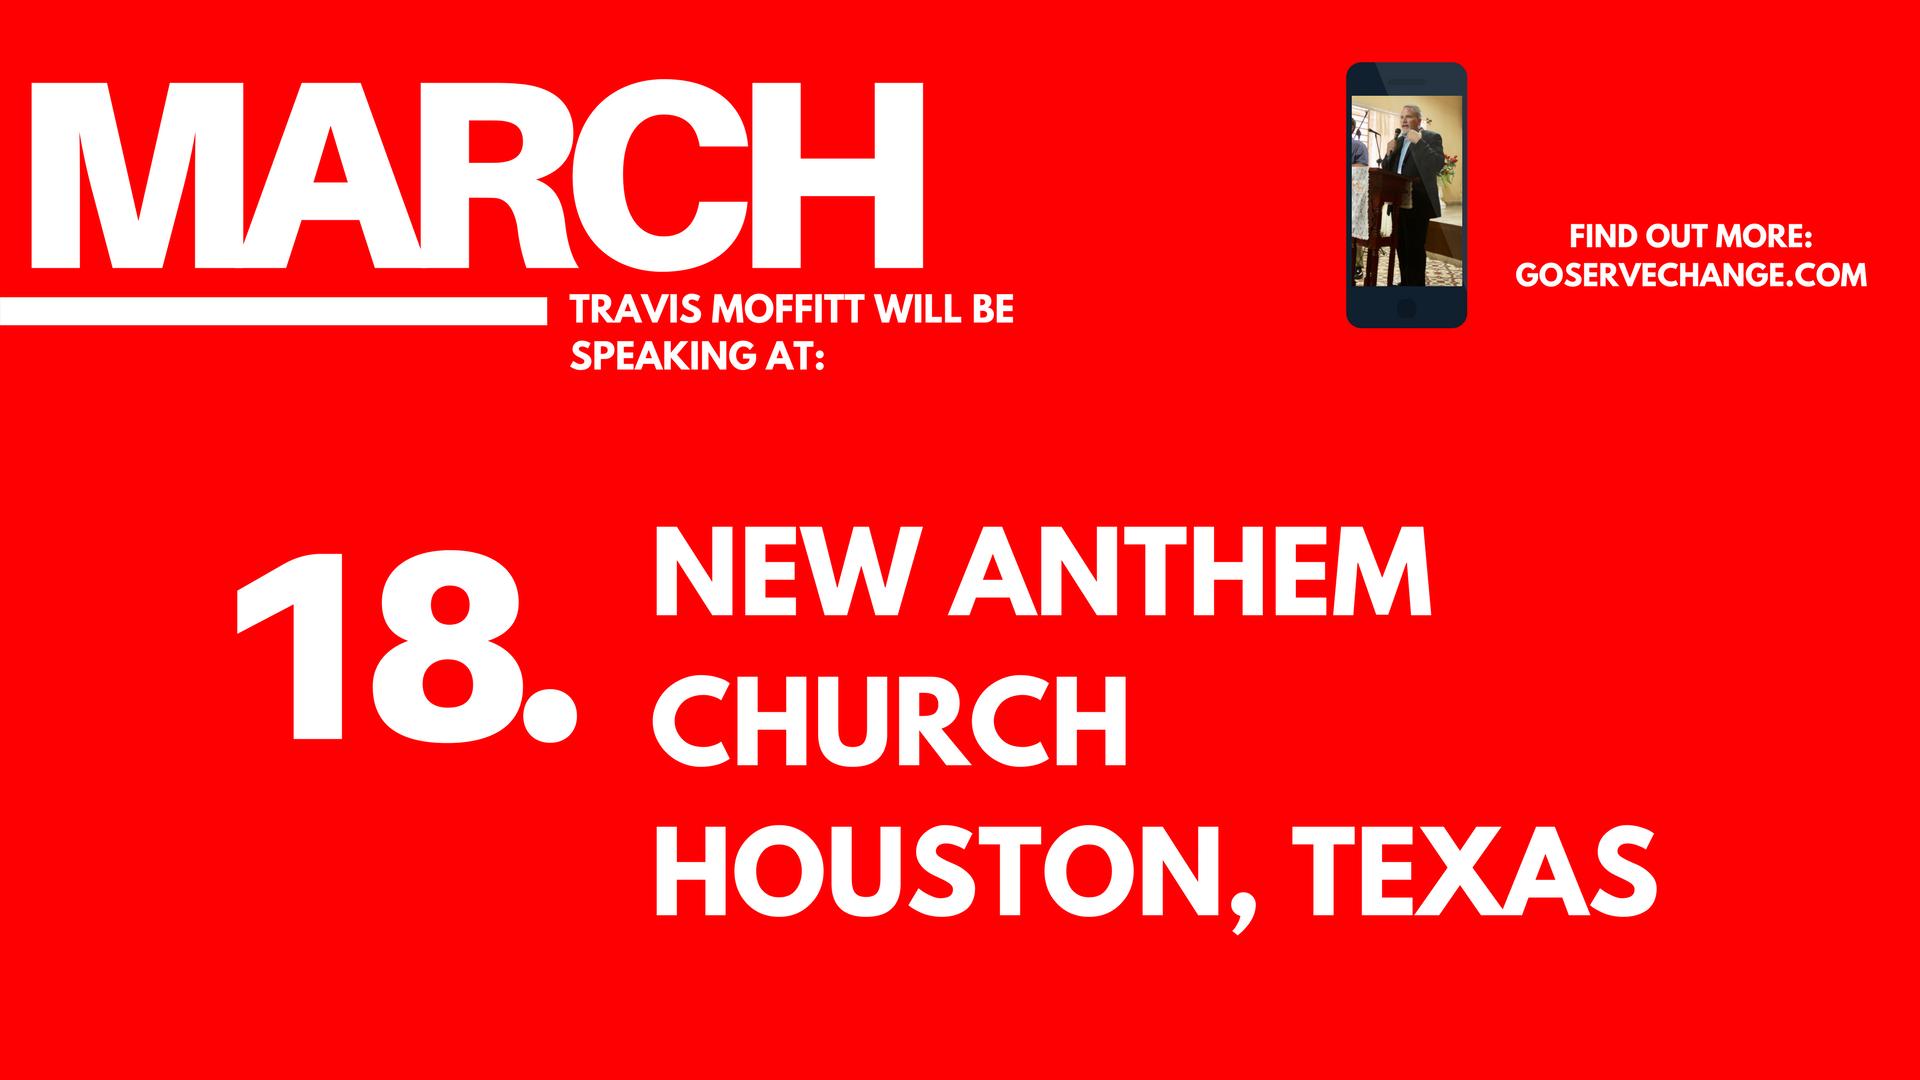 new anthem church - houston texas.png